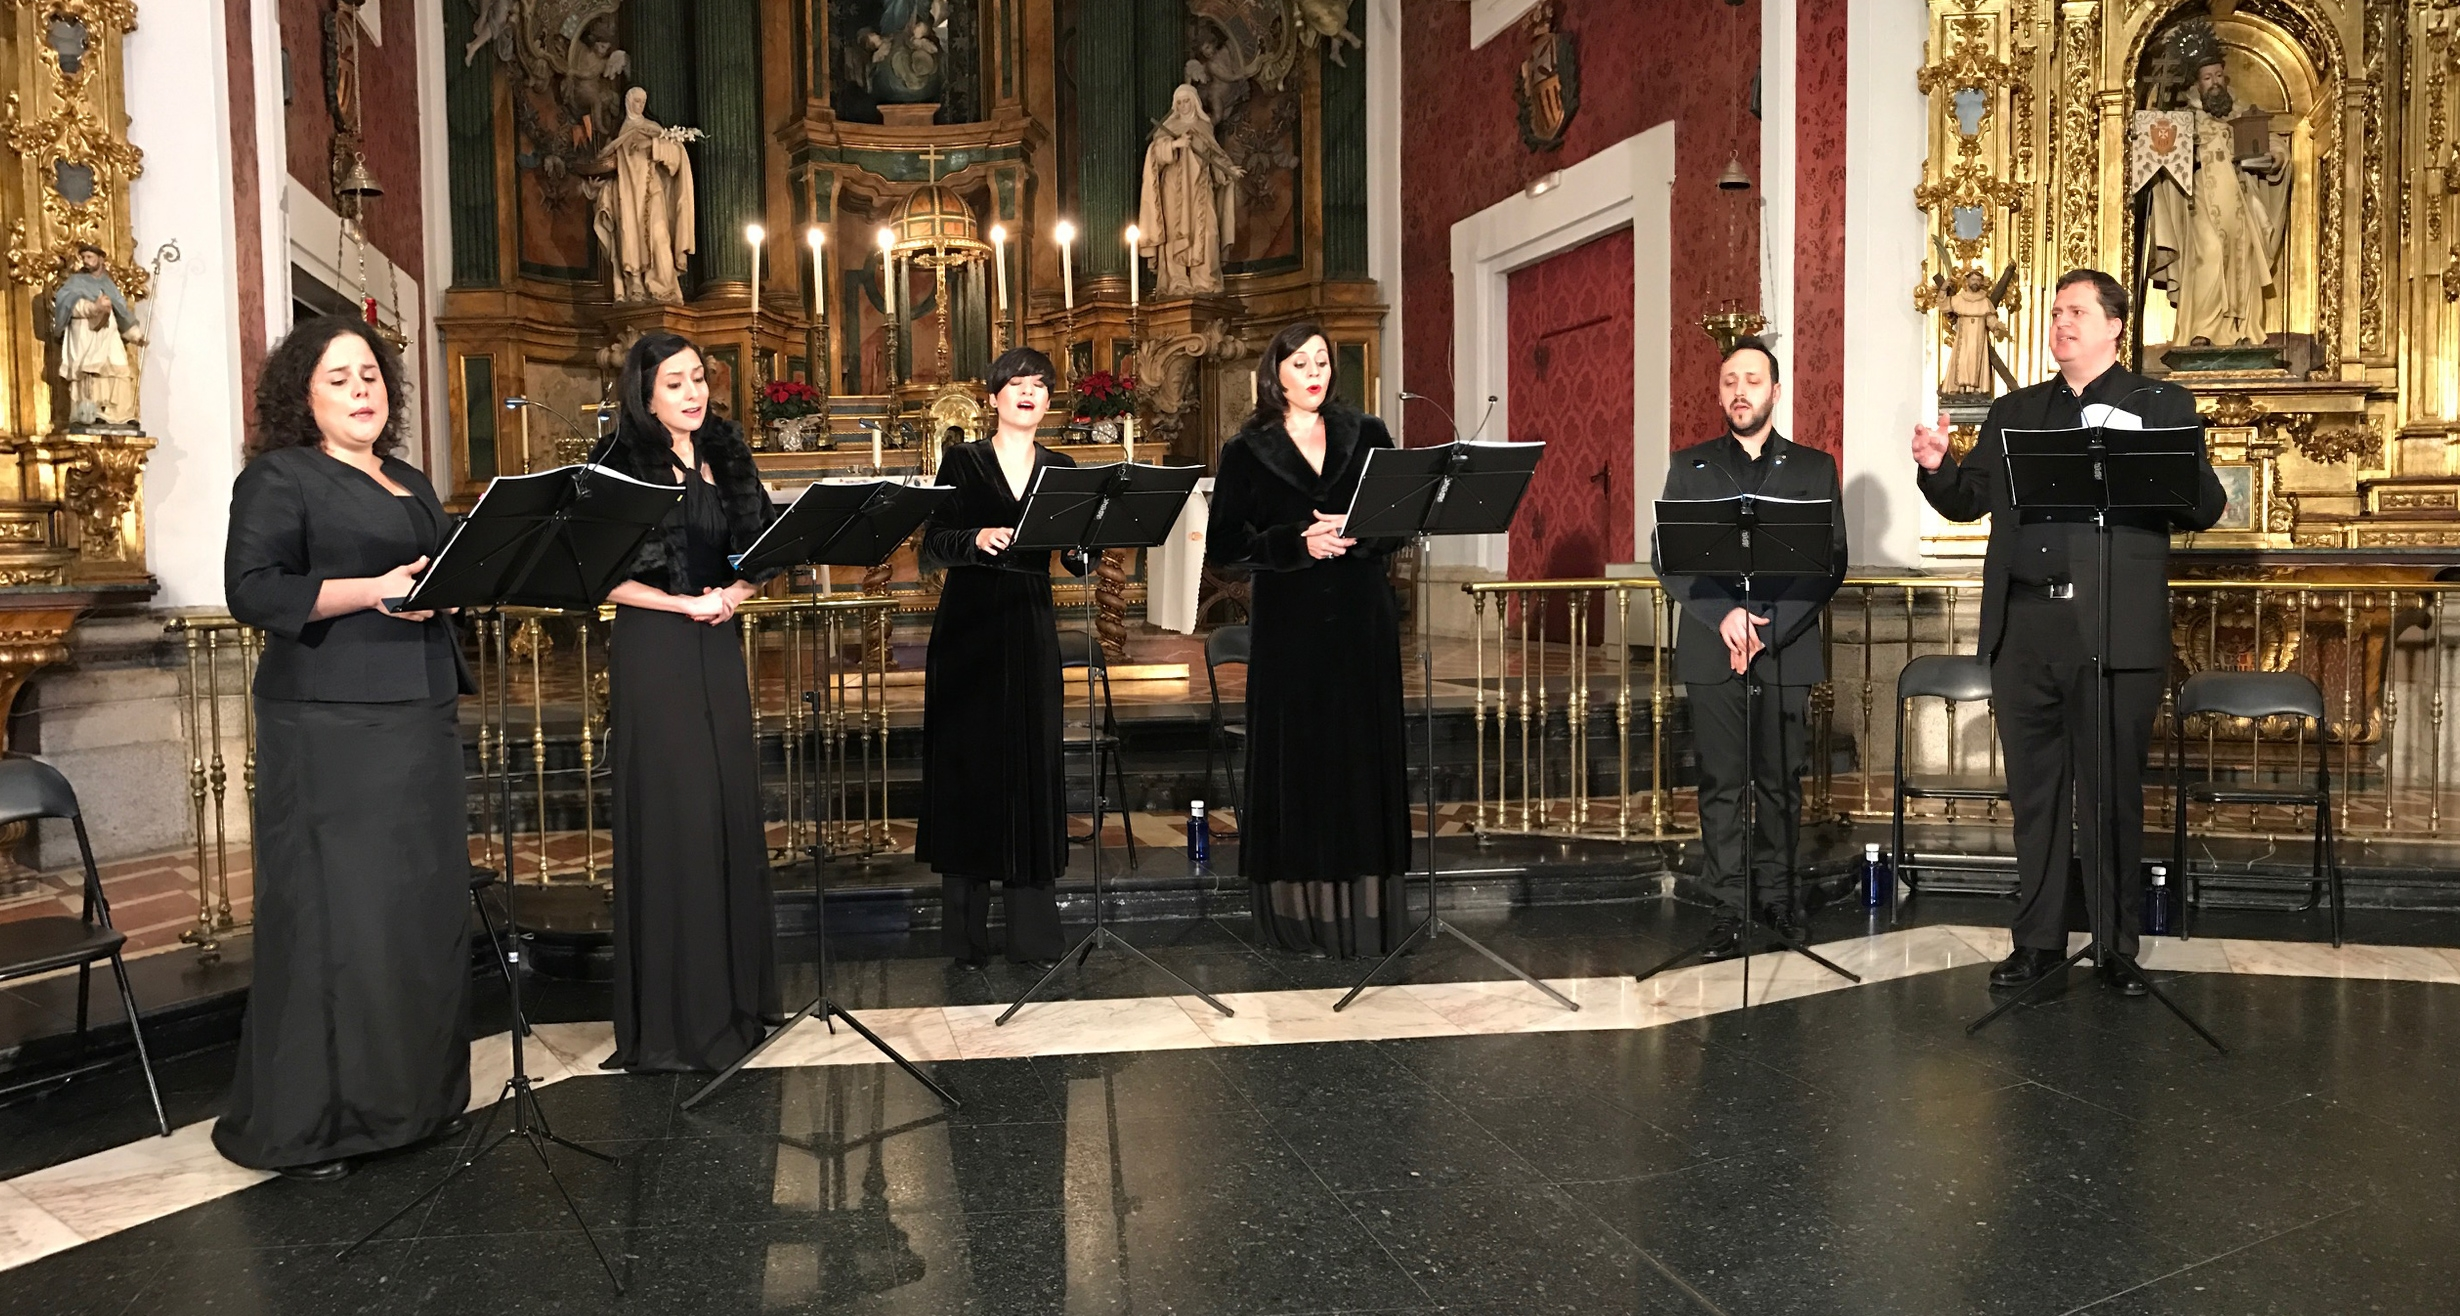 Magistral concierto del Coro Gradualia de la obra de Manuel Cardoso